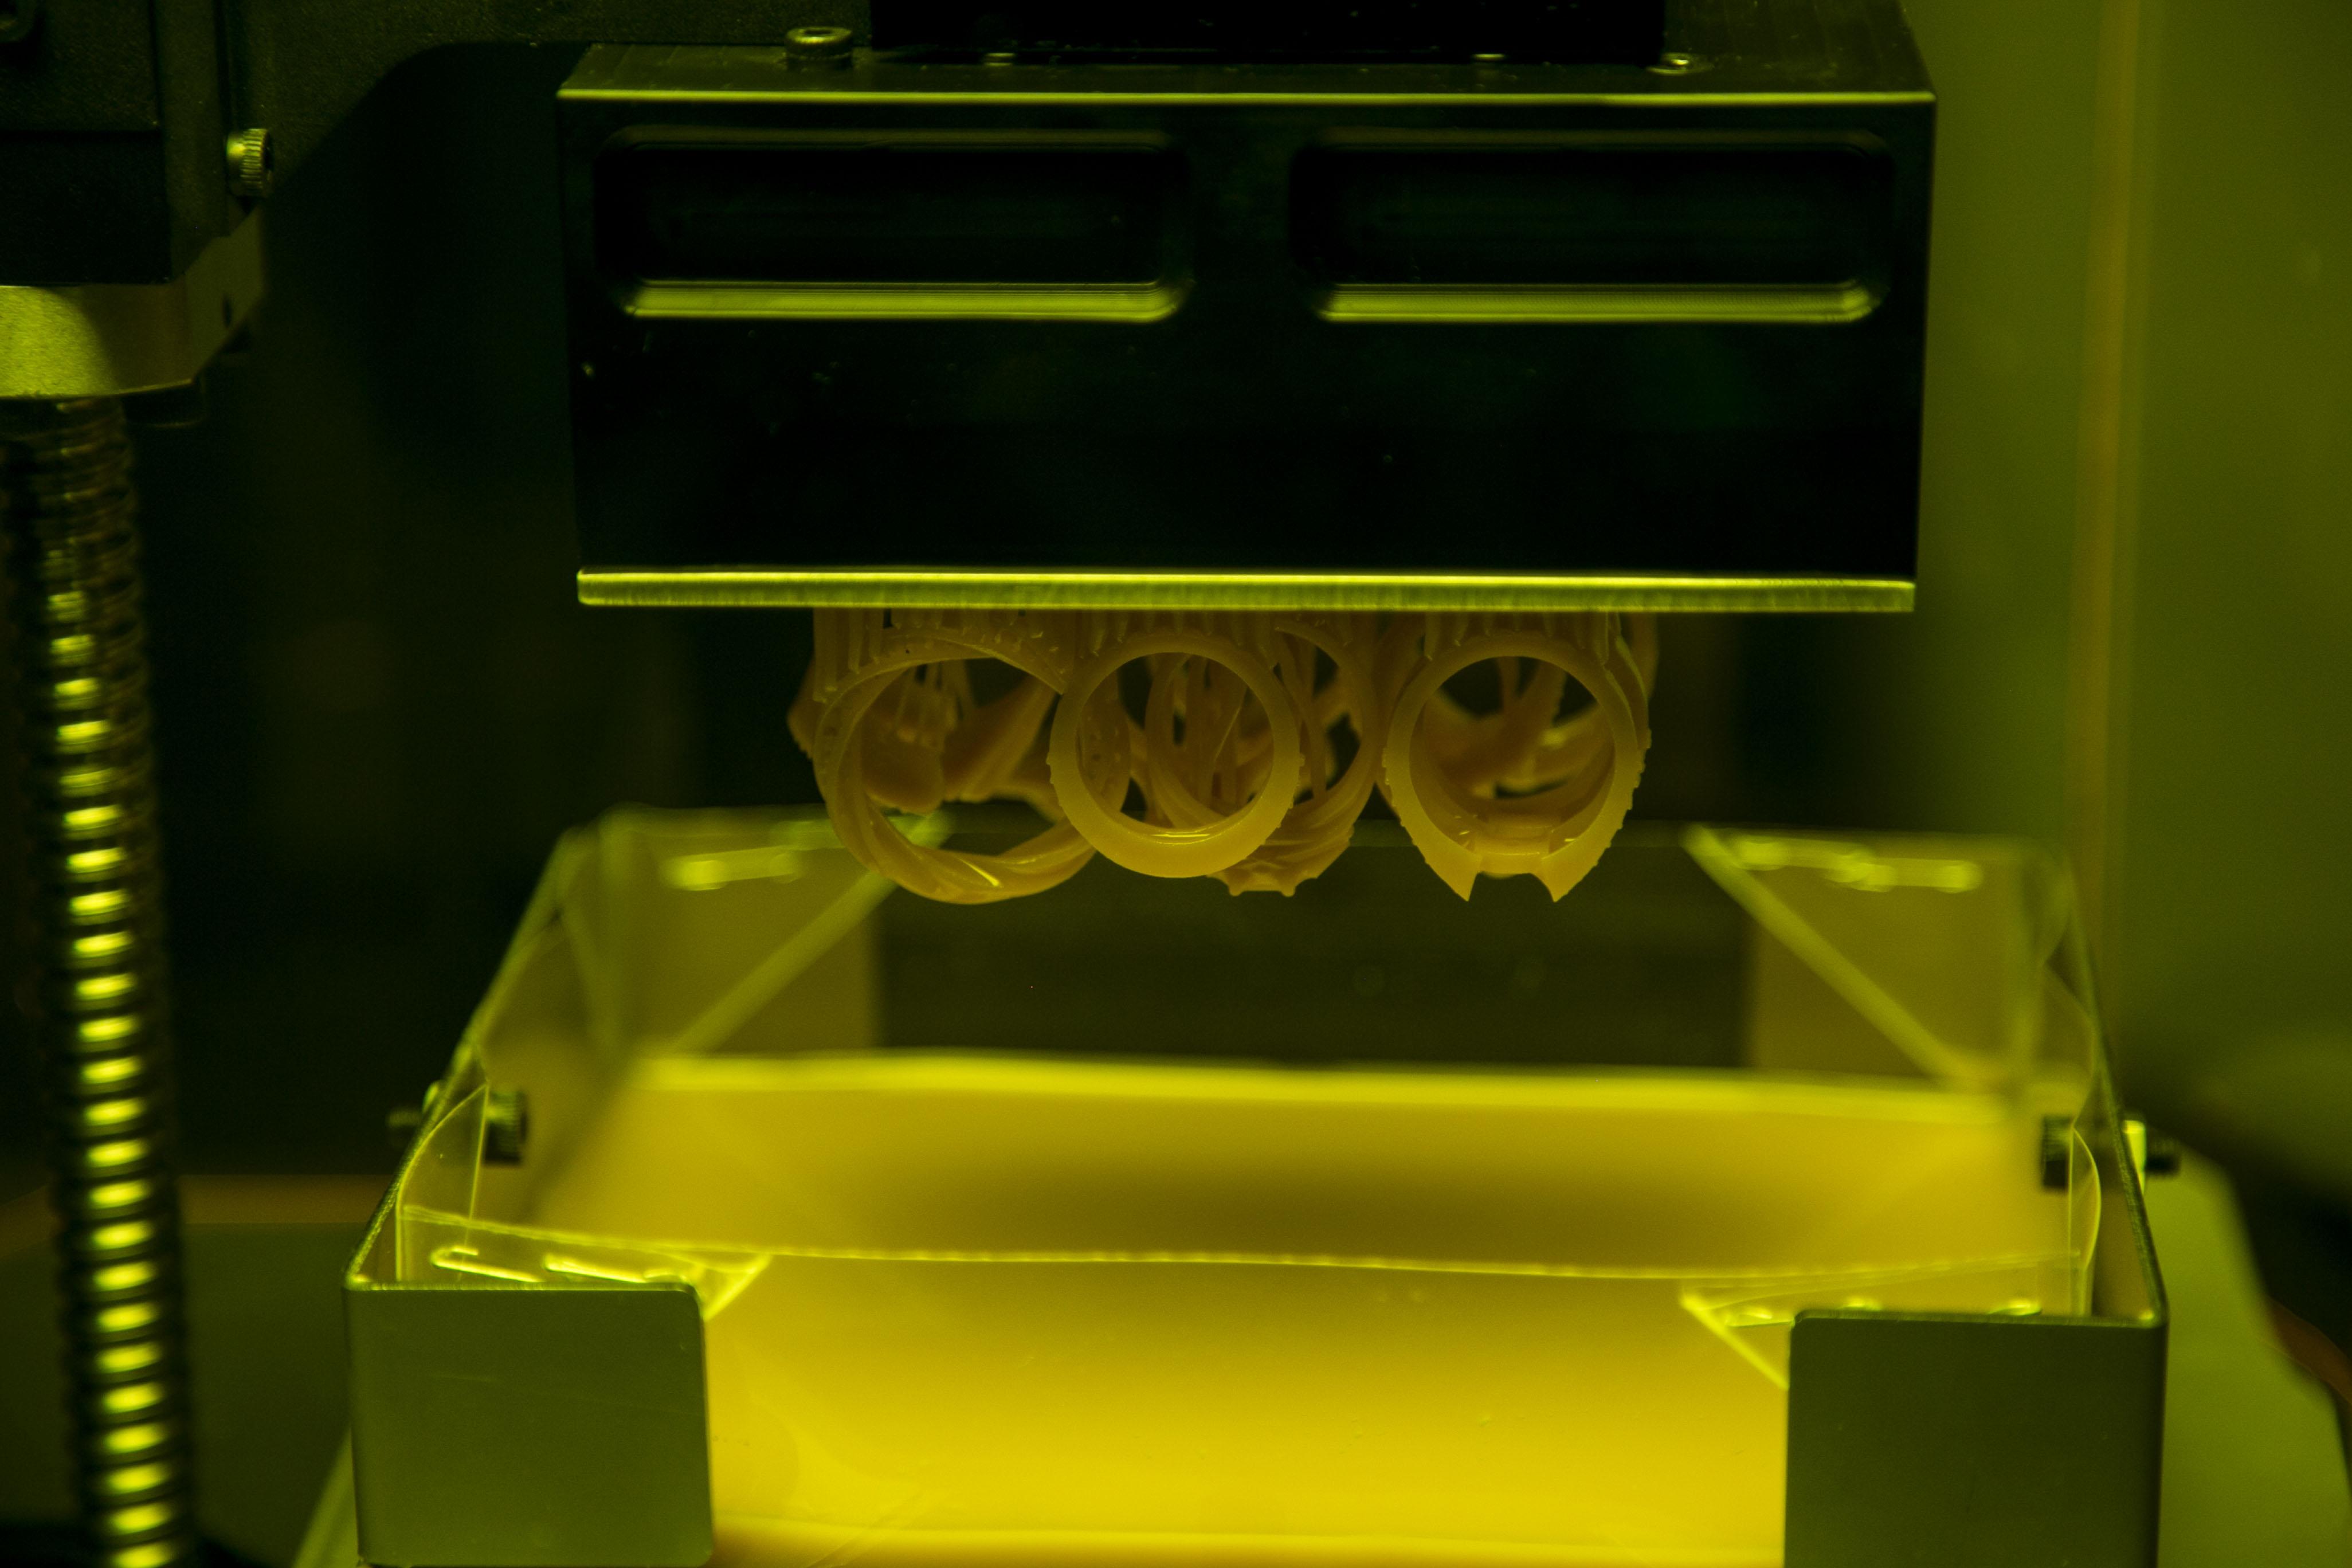 Full Spectrum Laser Debuts Phoenix Pro 3D Printer Line